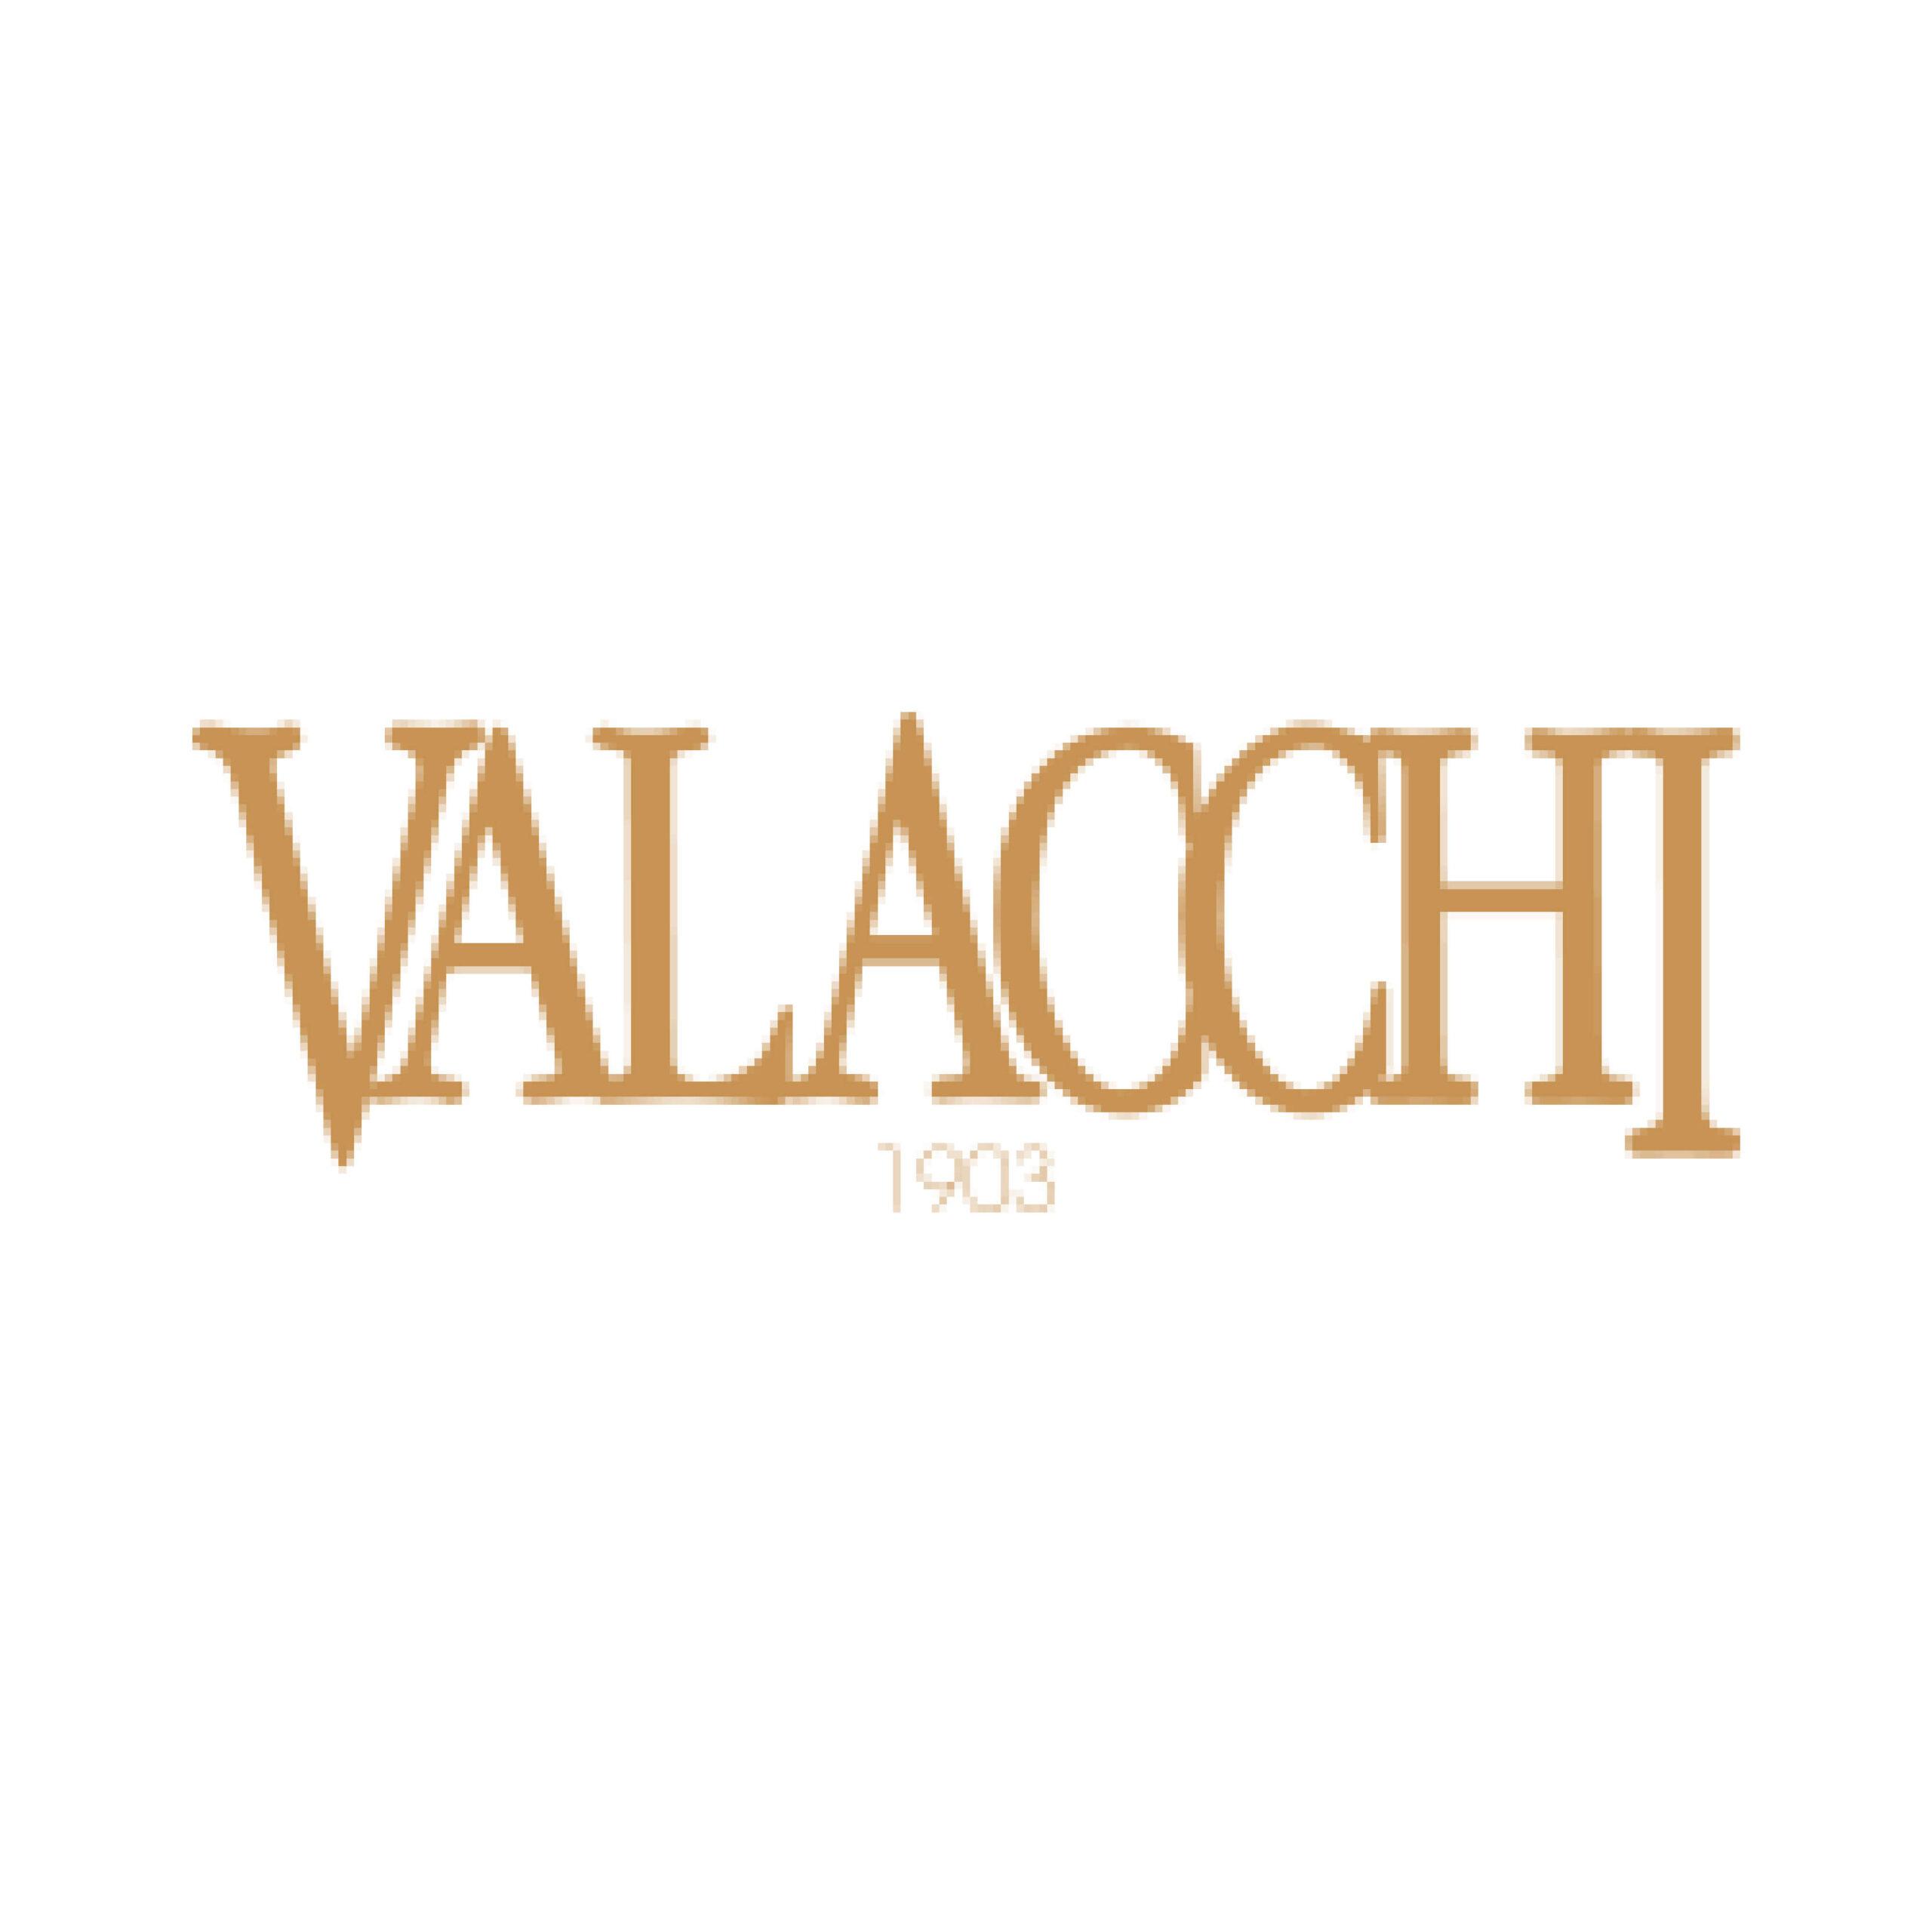 Valacchi 1903